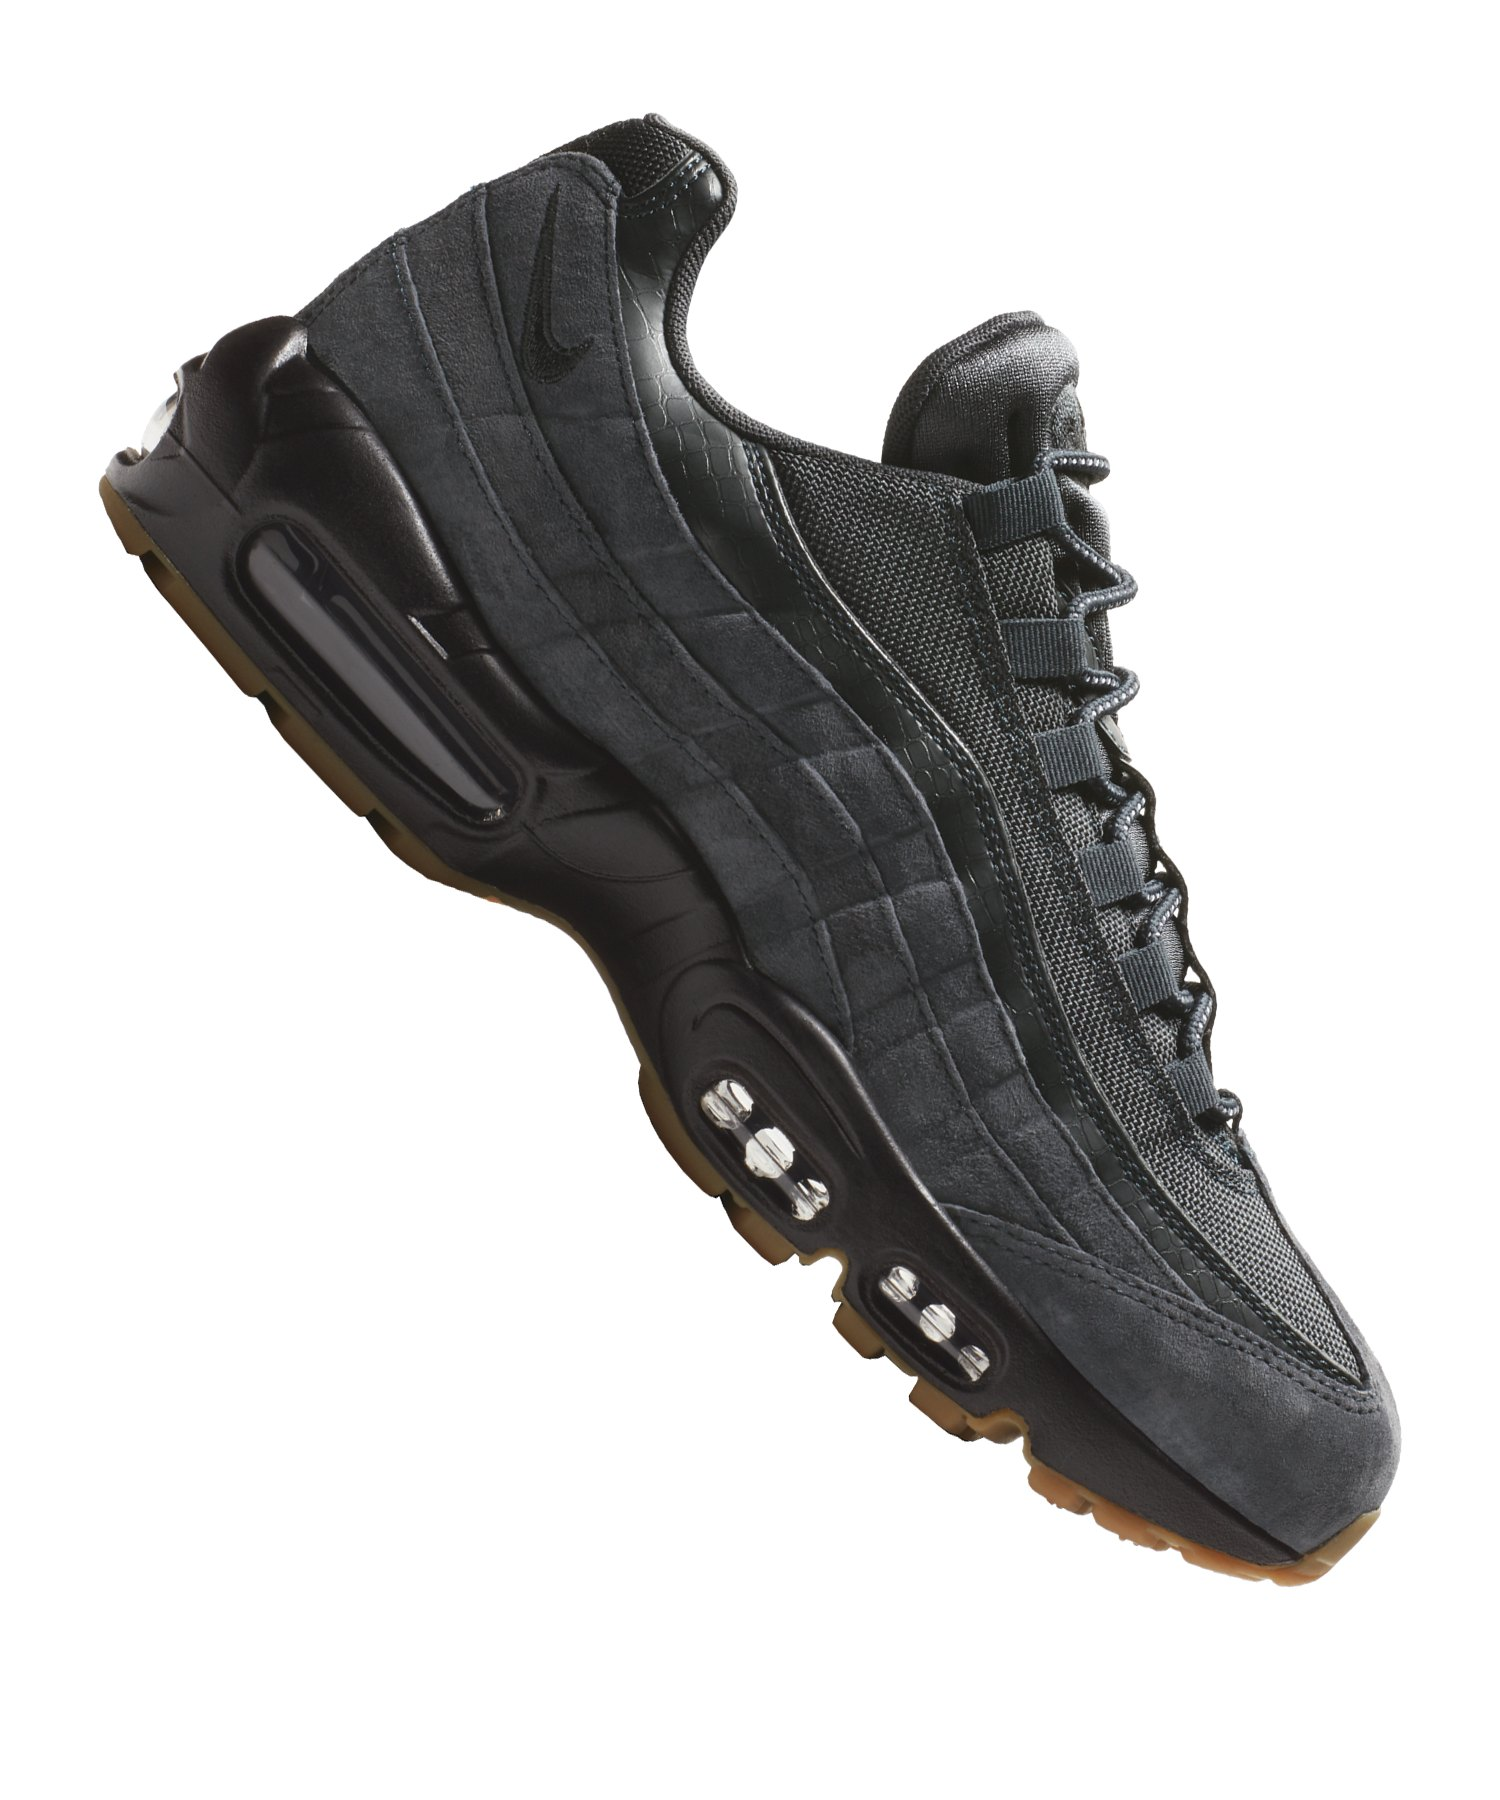 Nike Air Max 95 SE Sneaker Grau F002 |Streetstyle | Freizeit ...